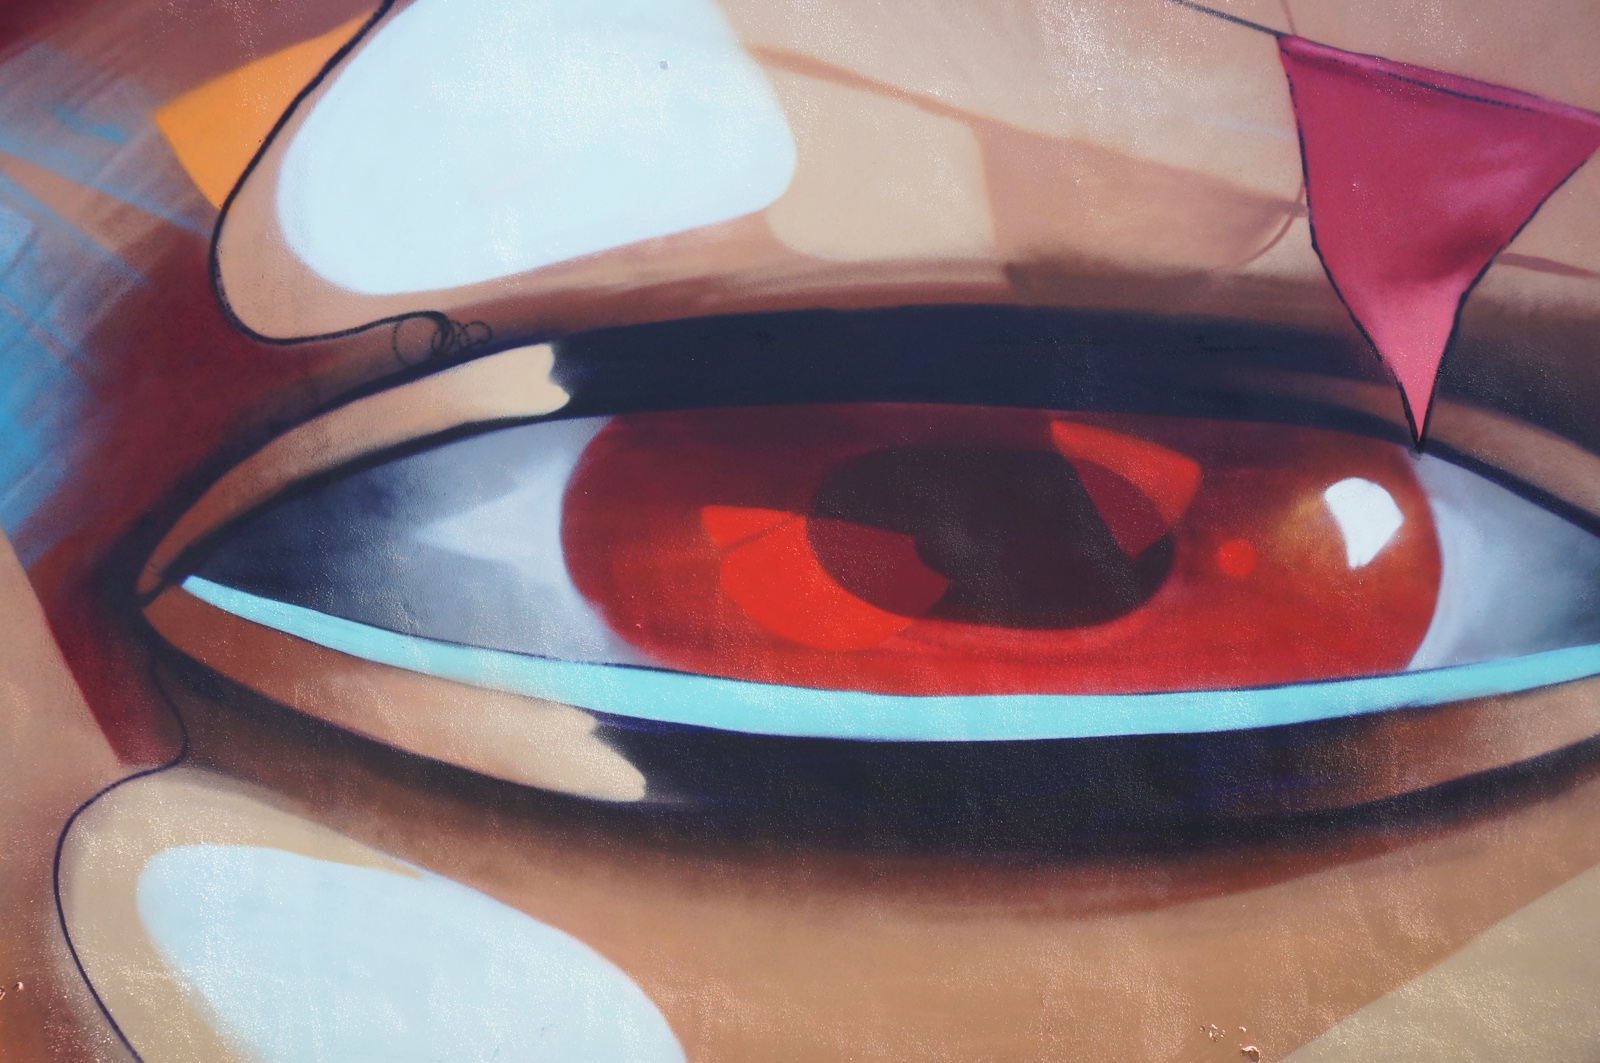 jade-pueblo-presente-new-mural-for-art-basel-2013-03